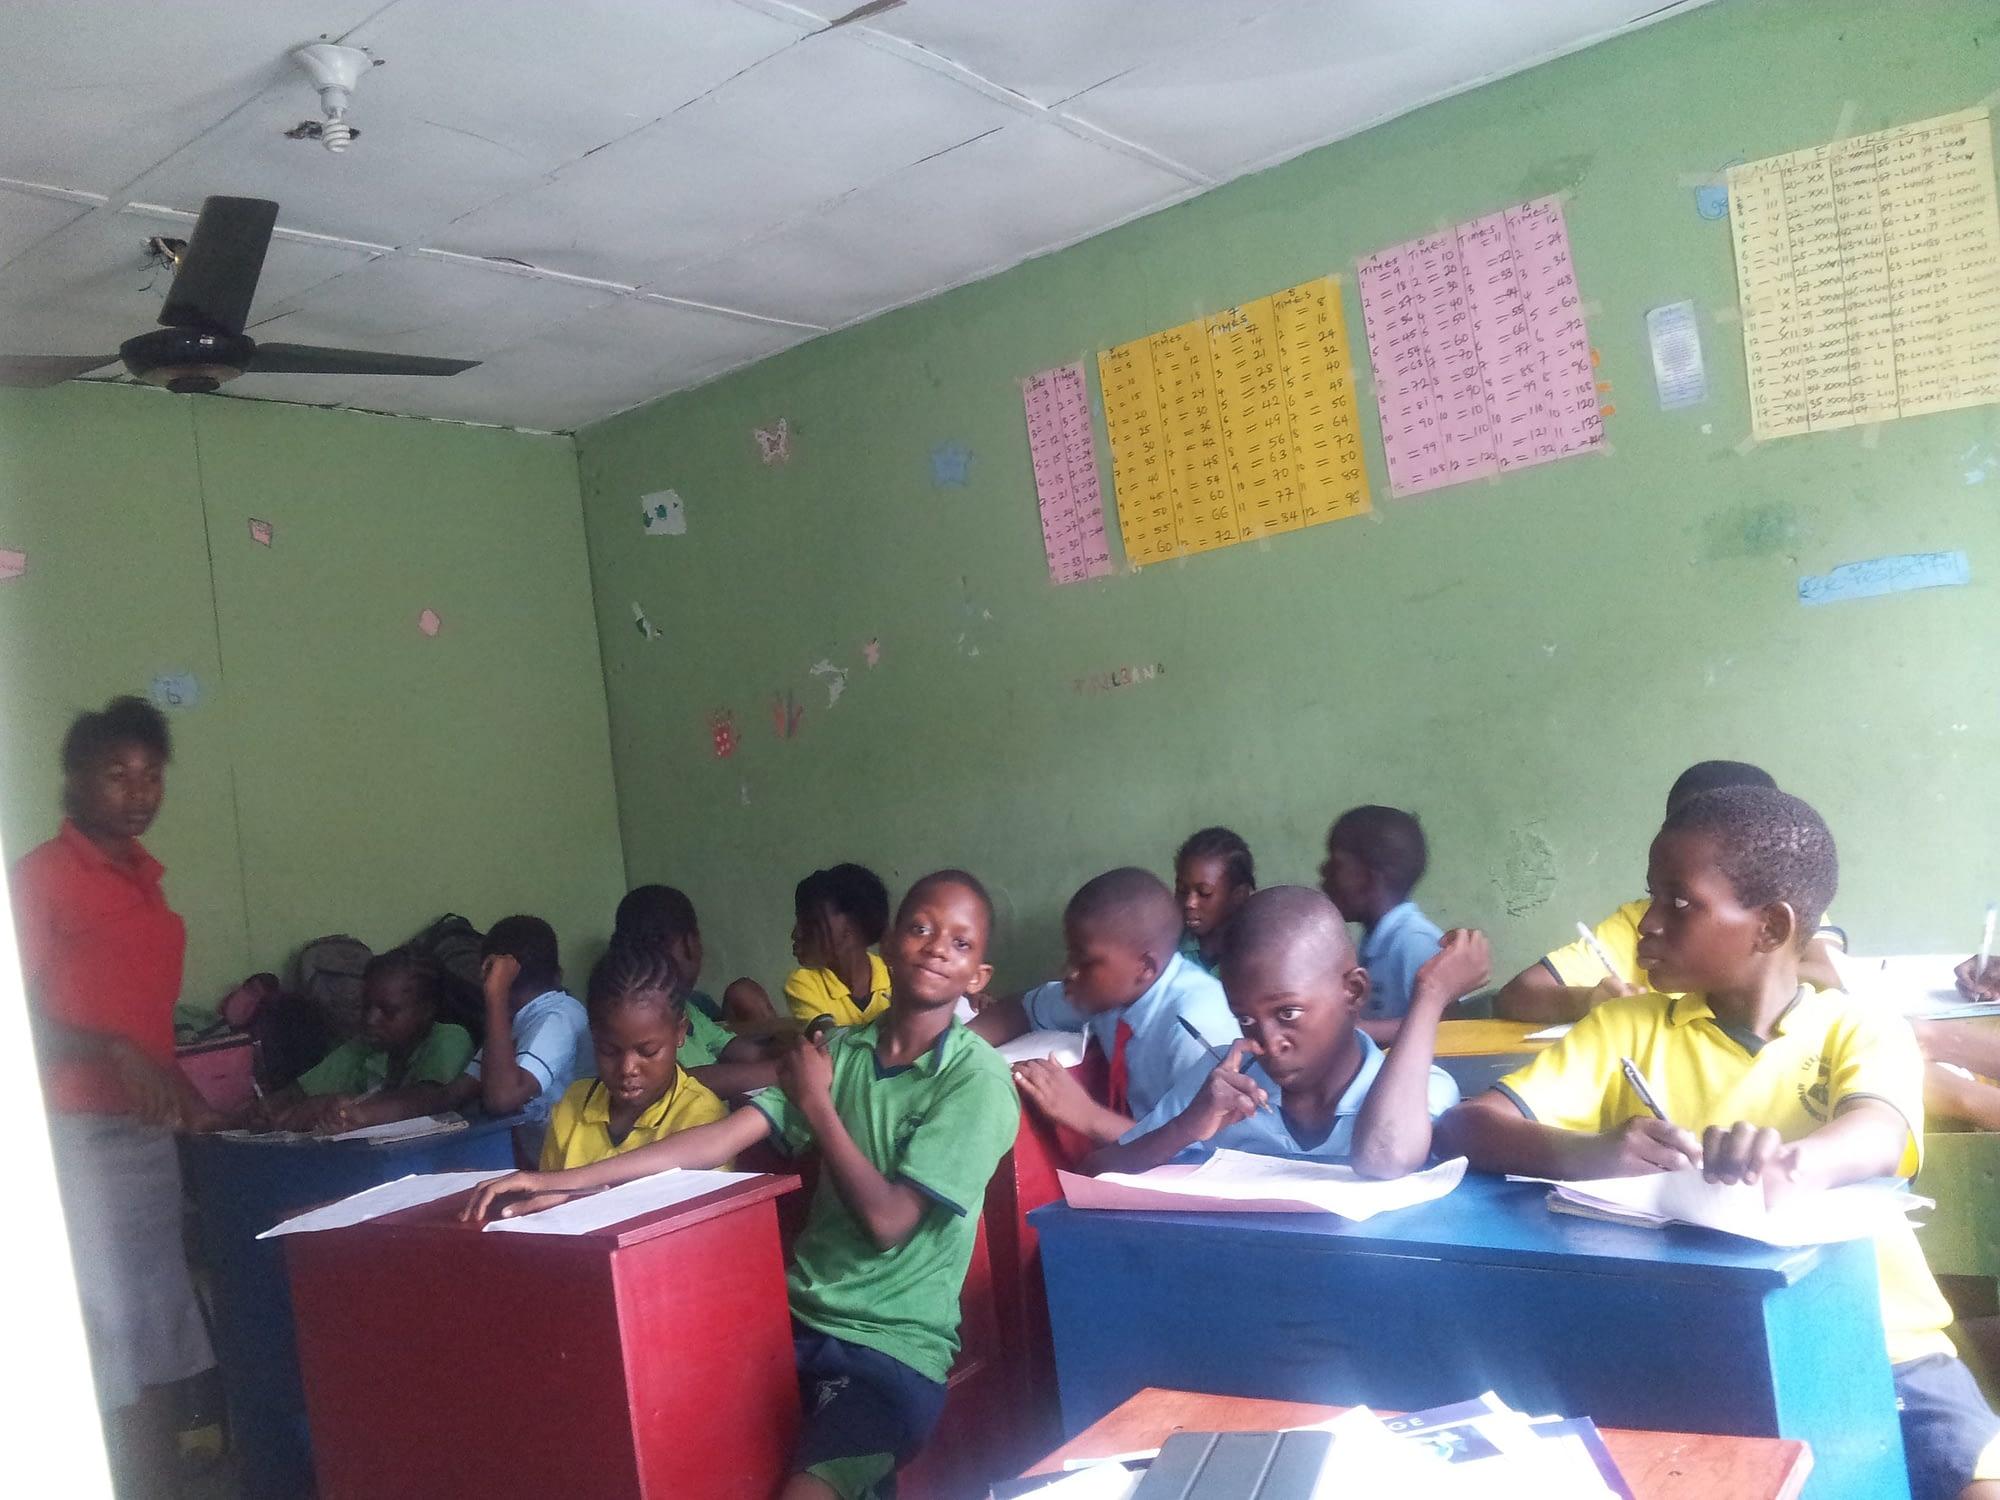 Students studying in the Lekki School classroom.